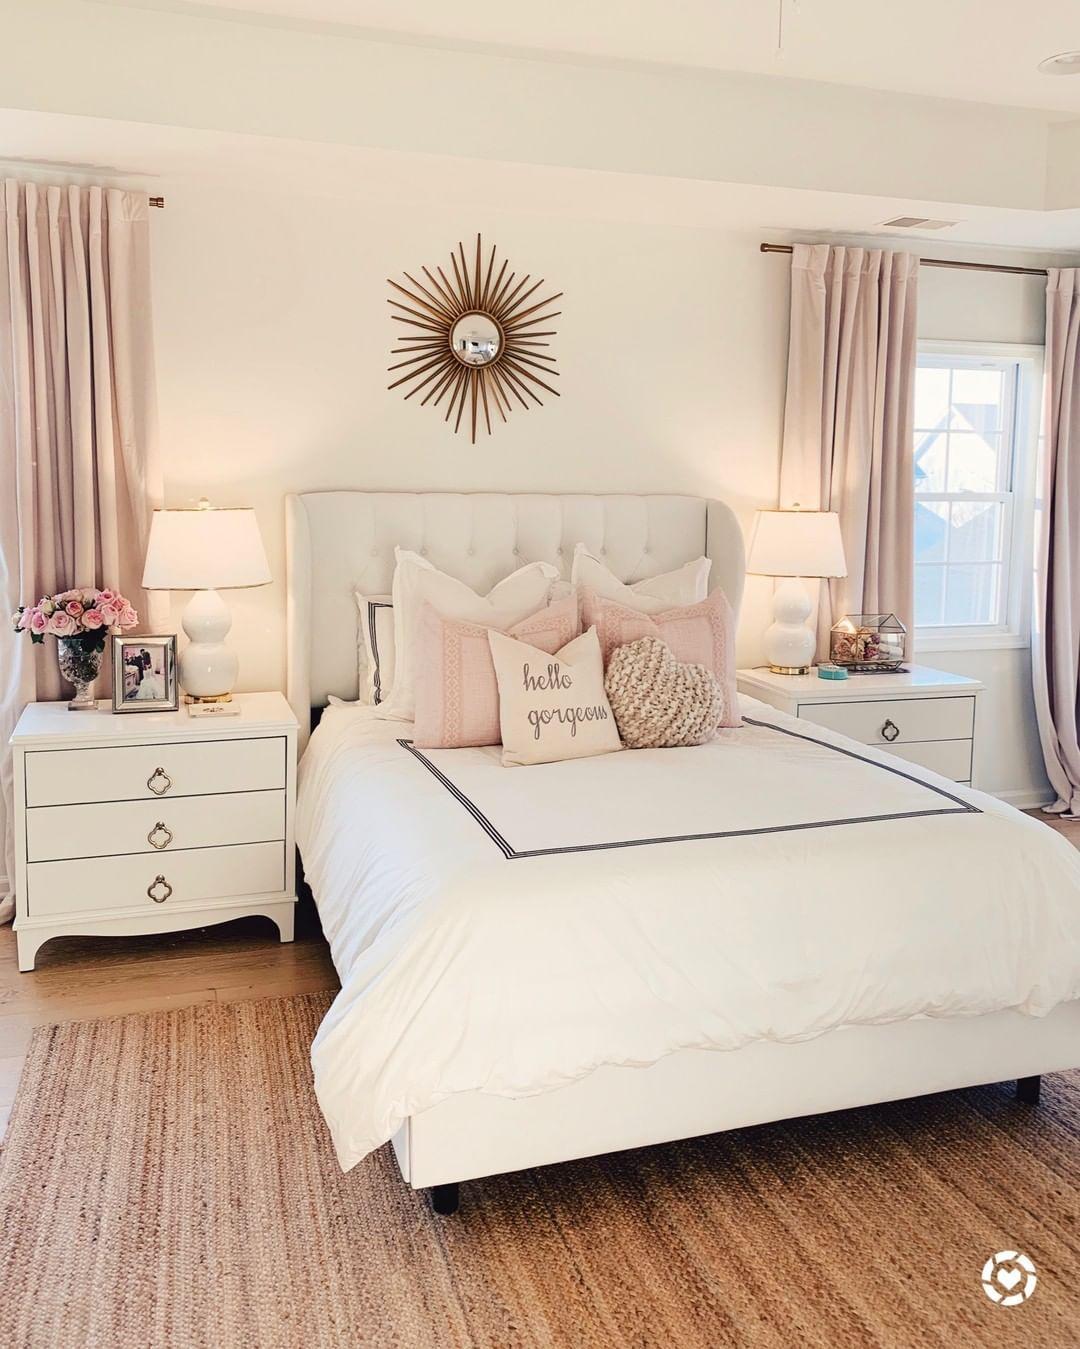 "LTKhome on Instagram """"The master bedroom is for"